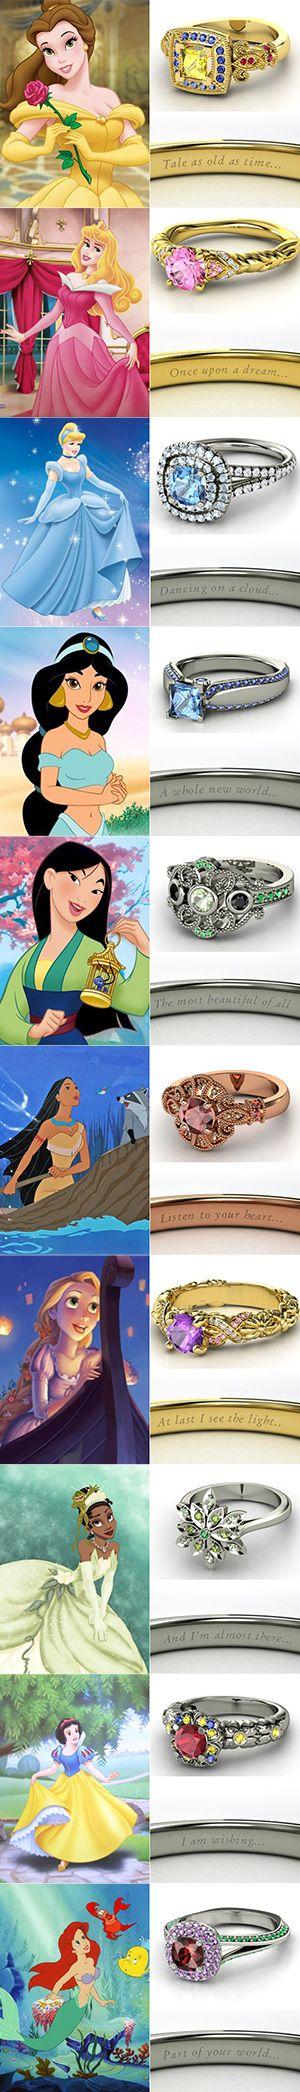 Disney-inspired engagement rings from Gemvara